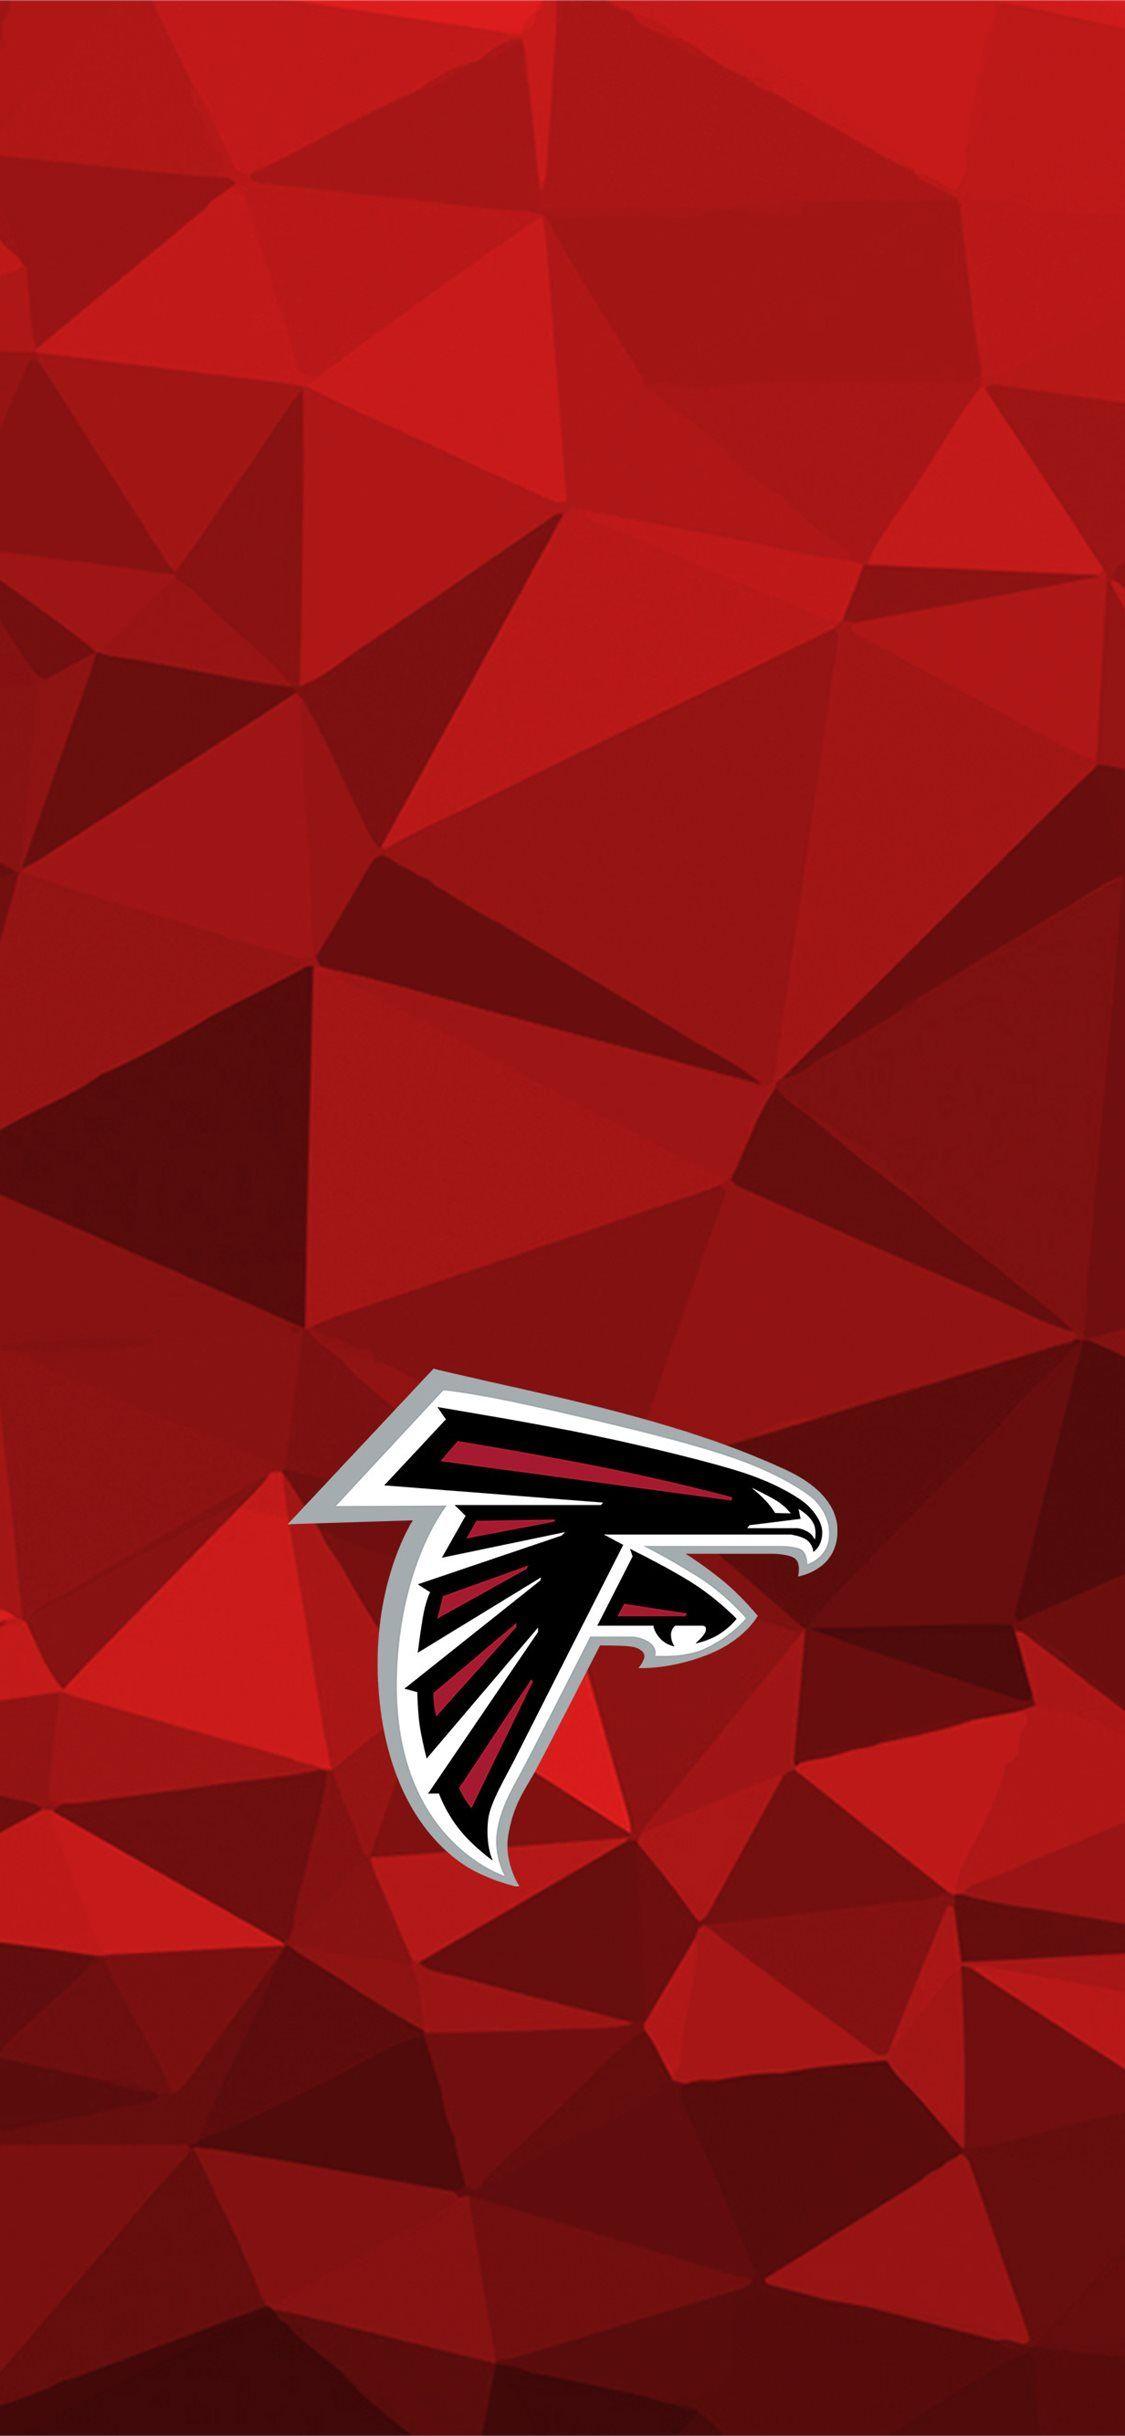 Patriots Wallpaper Tombrady Trends Iphonexwallpaper In 2020 Atlanta Falcons Wallpaper Atlanta Falcons Iphone Wallpaper